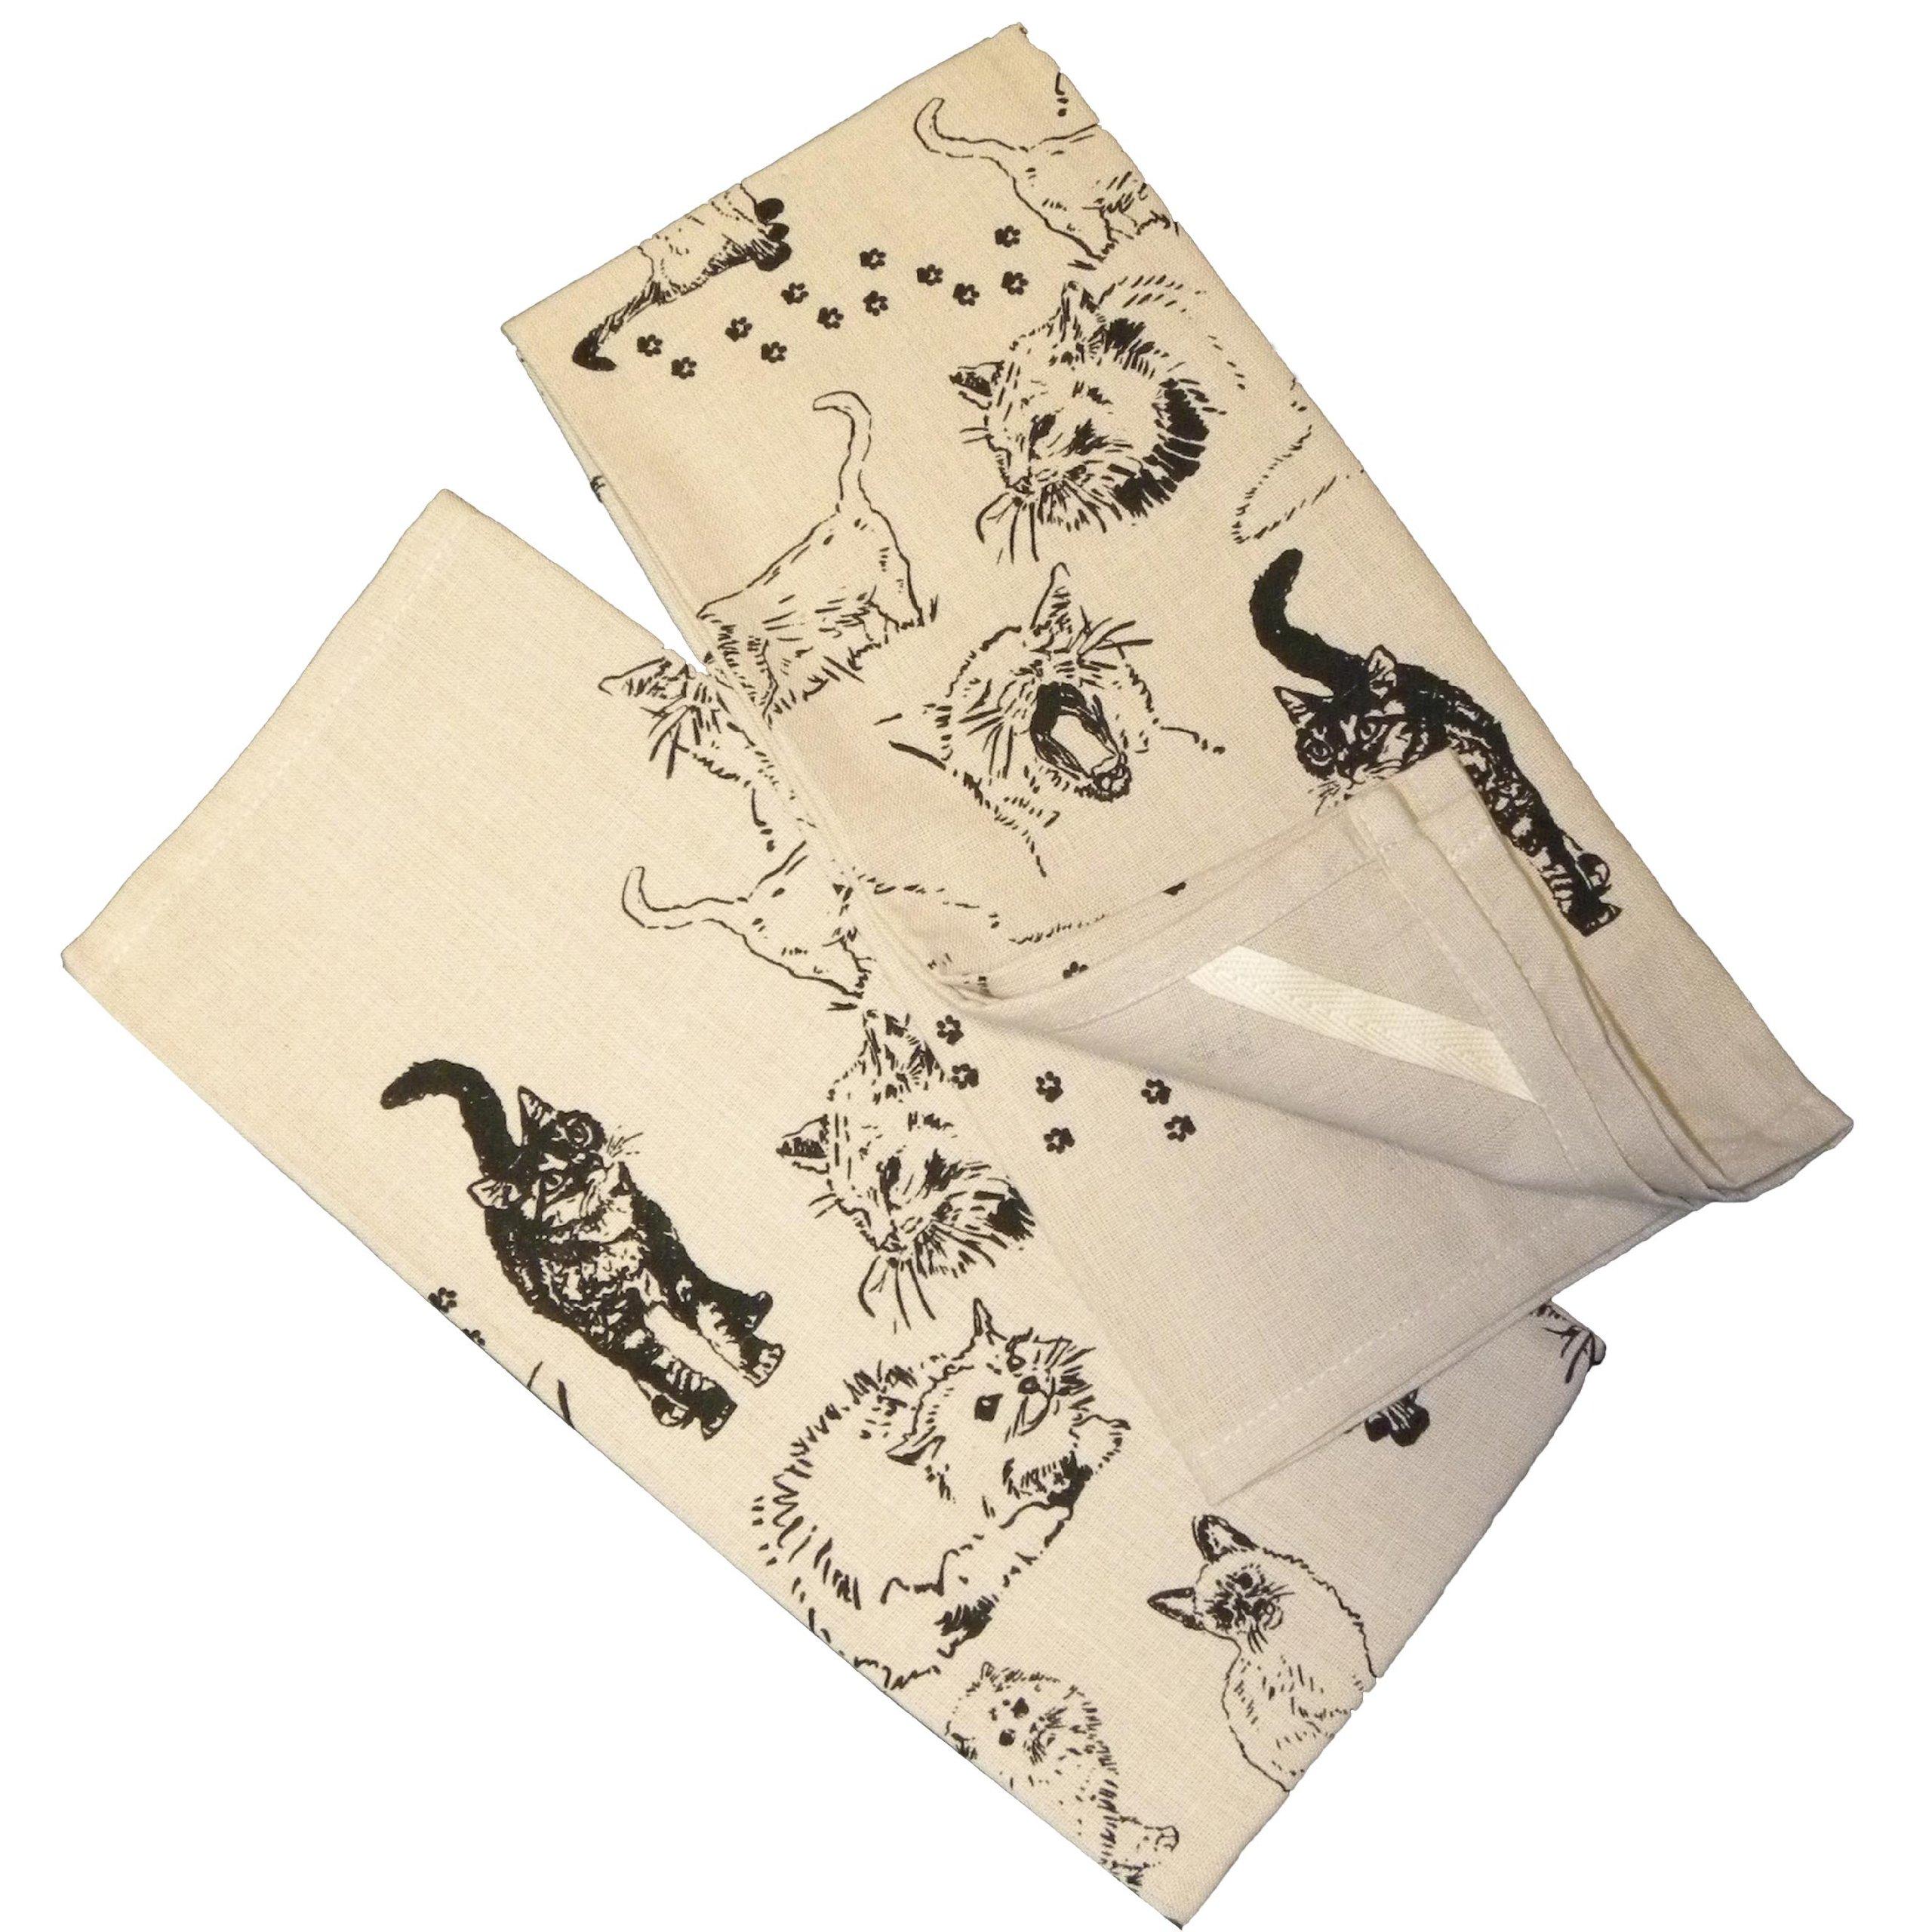 Krazy Kats Cats Kitchen Towels, Set of 2 Natural